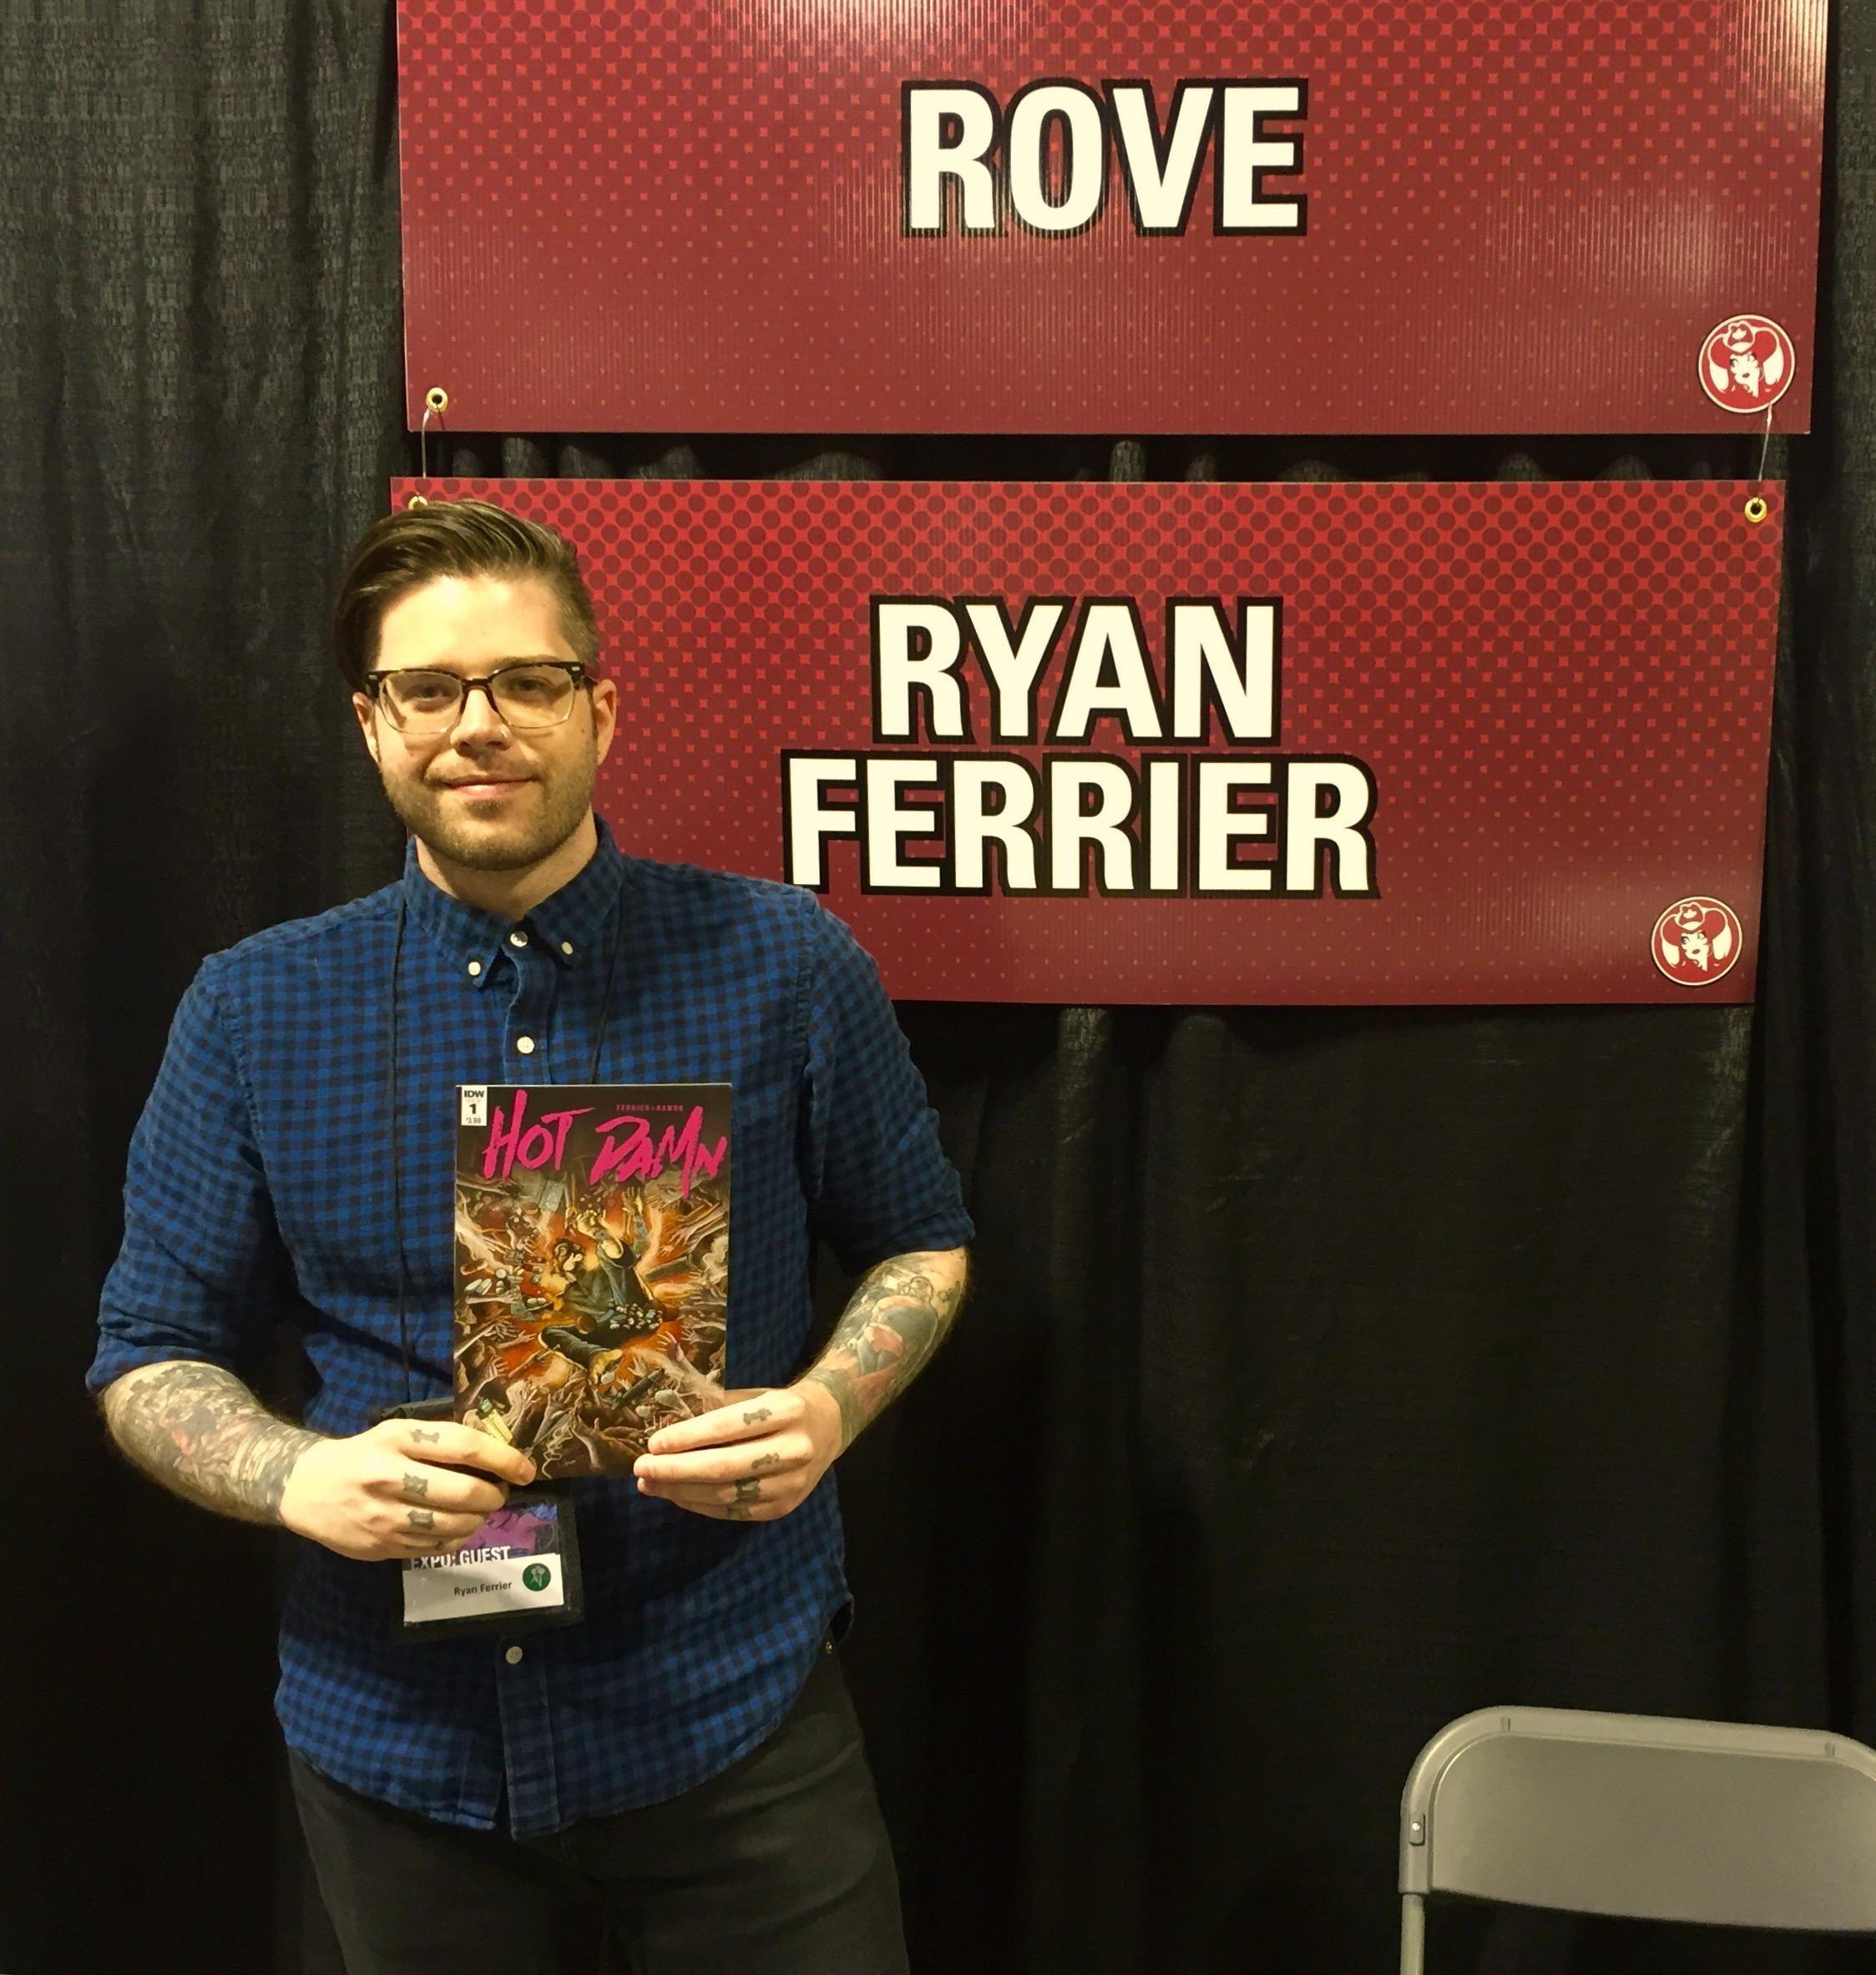 Ryan Ferrier at the 2016 Calgary Expo. (Photo credit: Chris Doucher/GeekNerdNet)